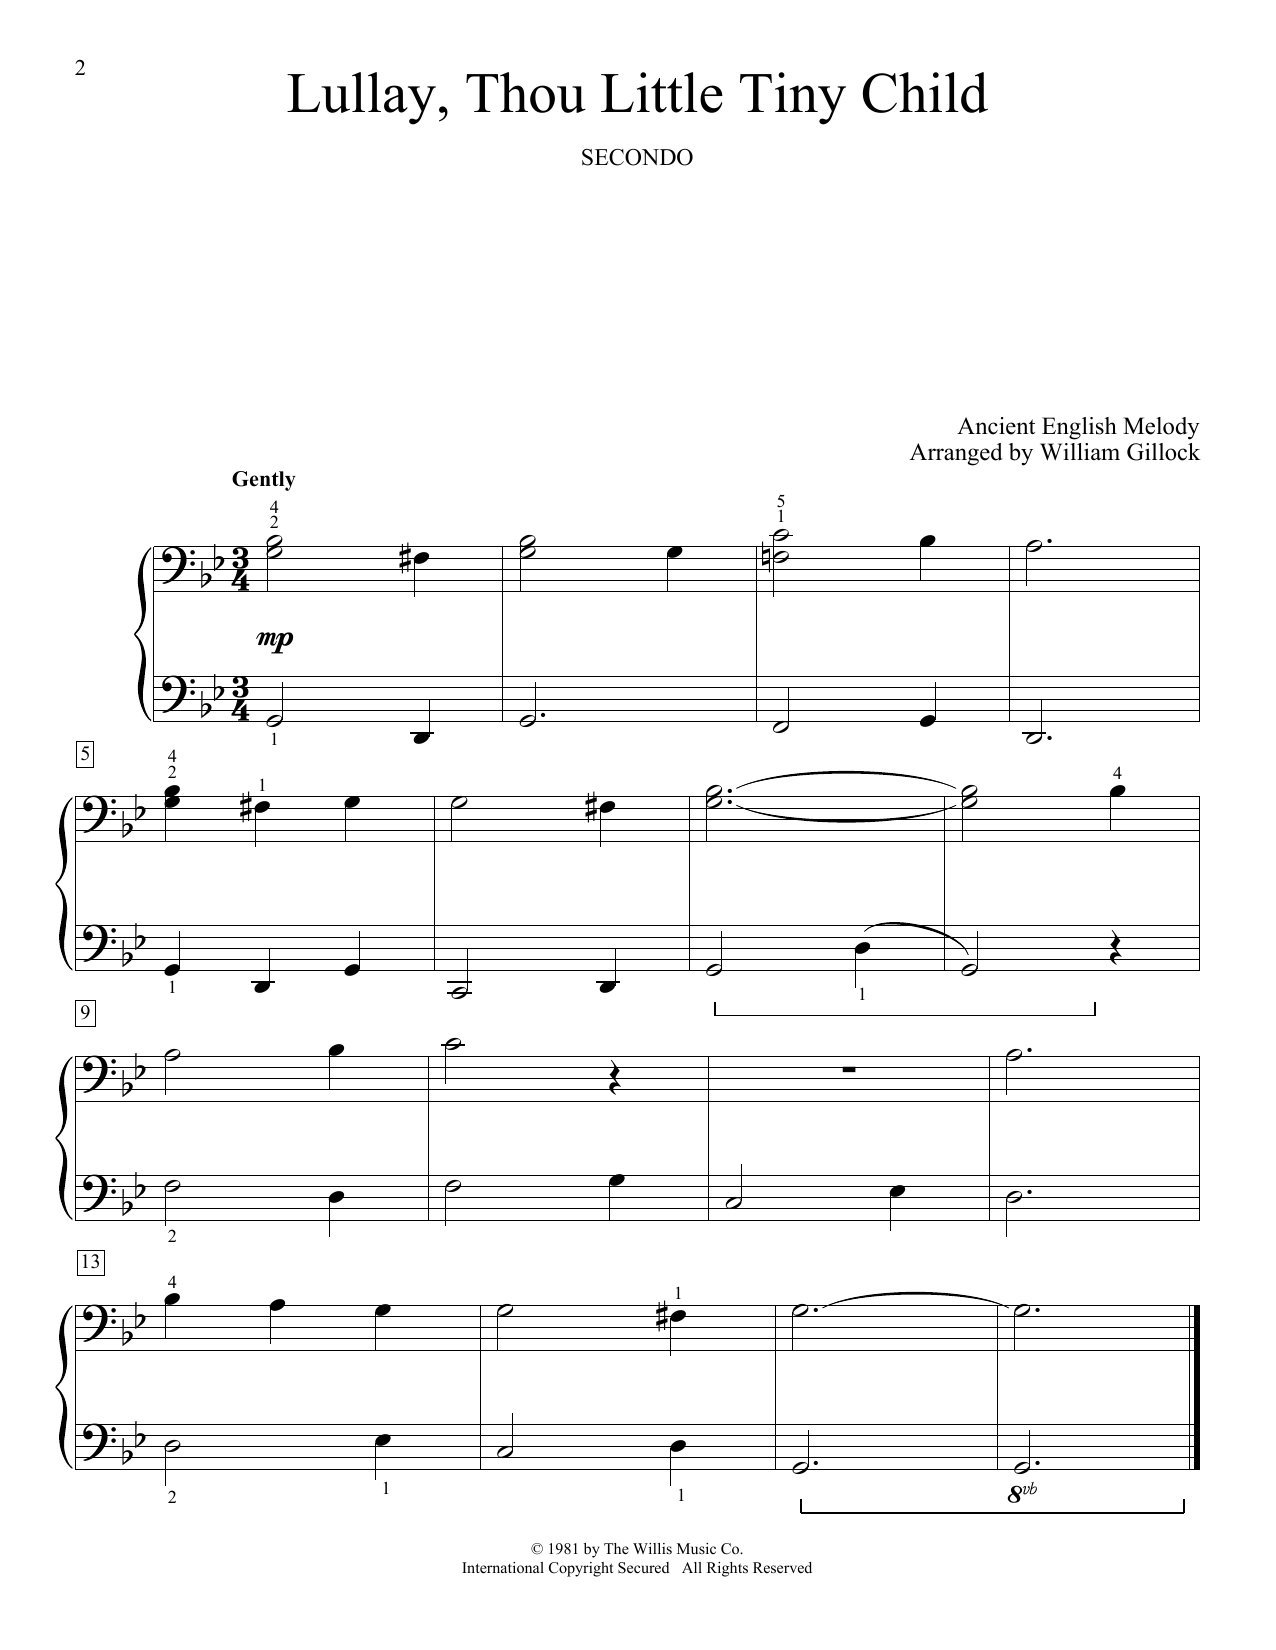 Lullay, Thou Little Tiny Child (Piano Duet)